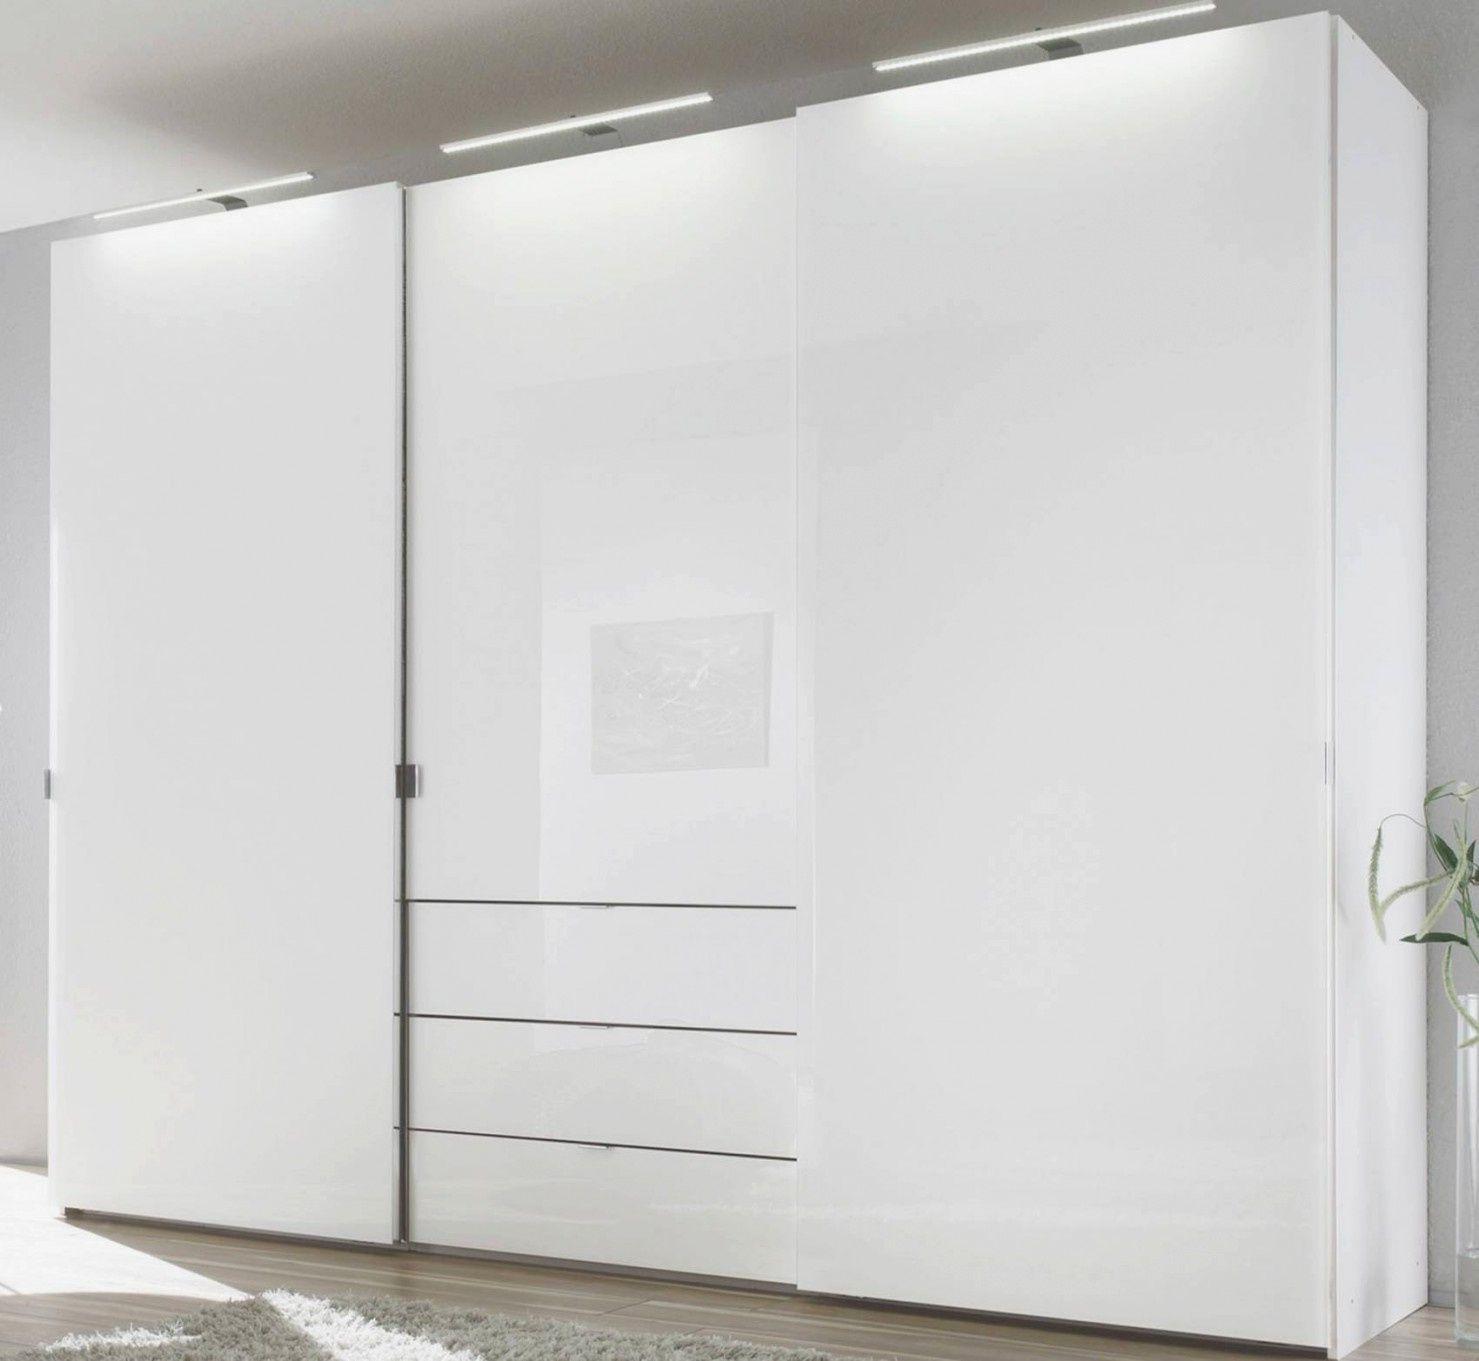 Pin By Sheilla Nancie On Kinderzimmer Ideen Tall Cabinet Storage